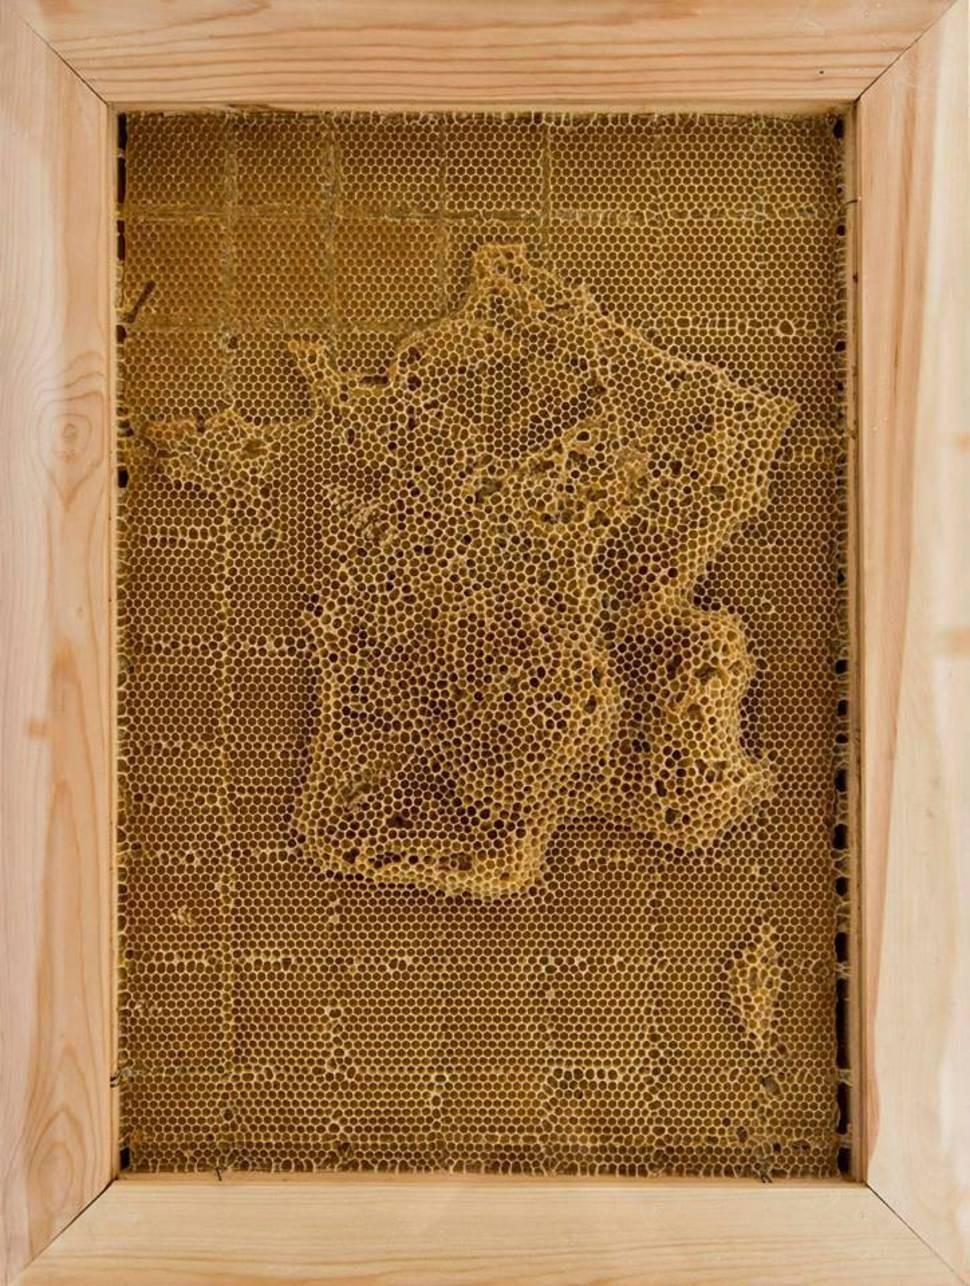 Франция воск, карта, пчела, скульптура